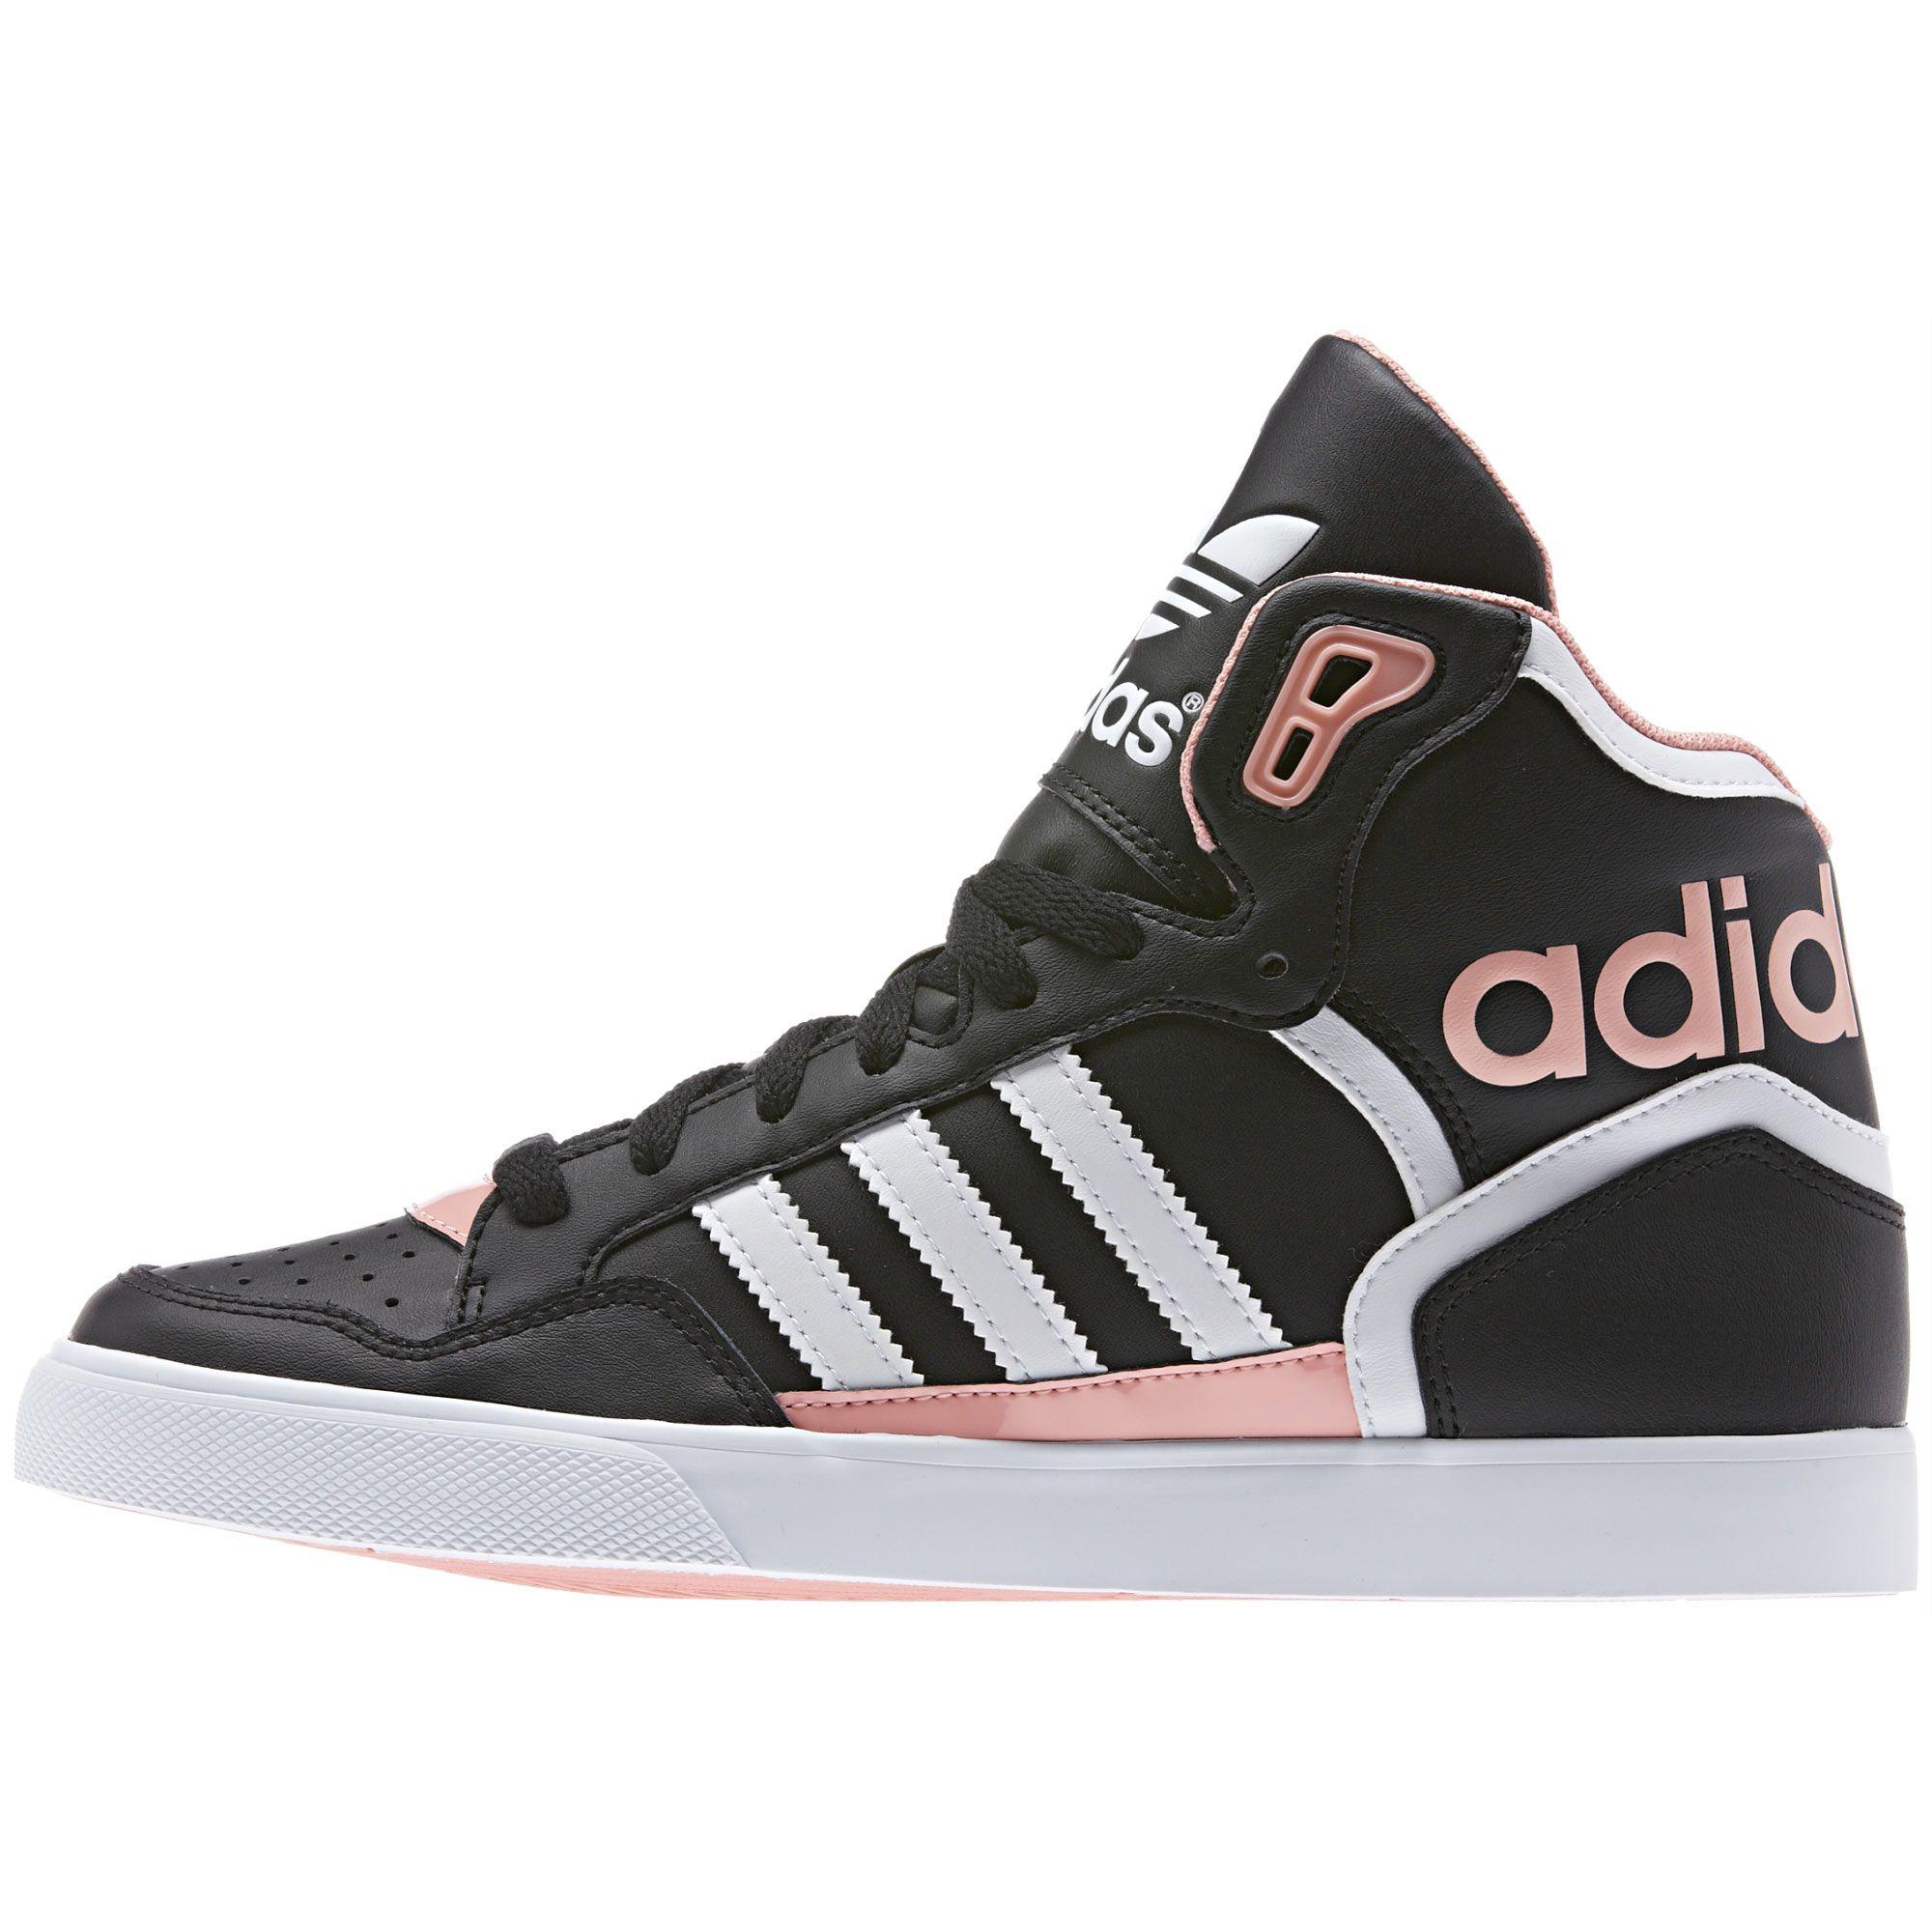 adidas donne extaball scarpe adidas unito scarpe pinterest